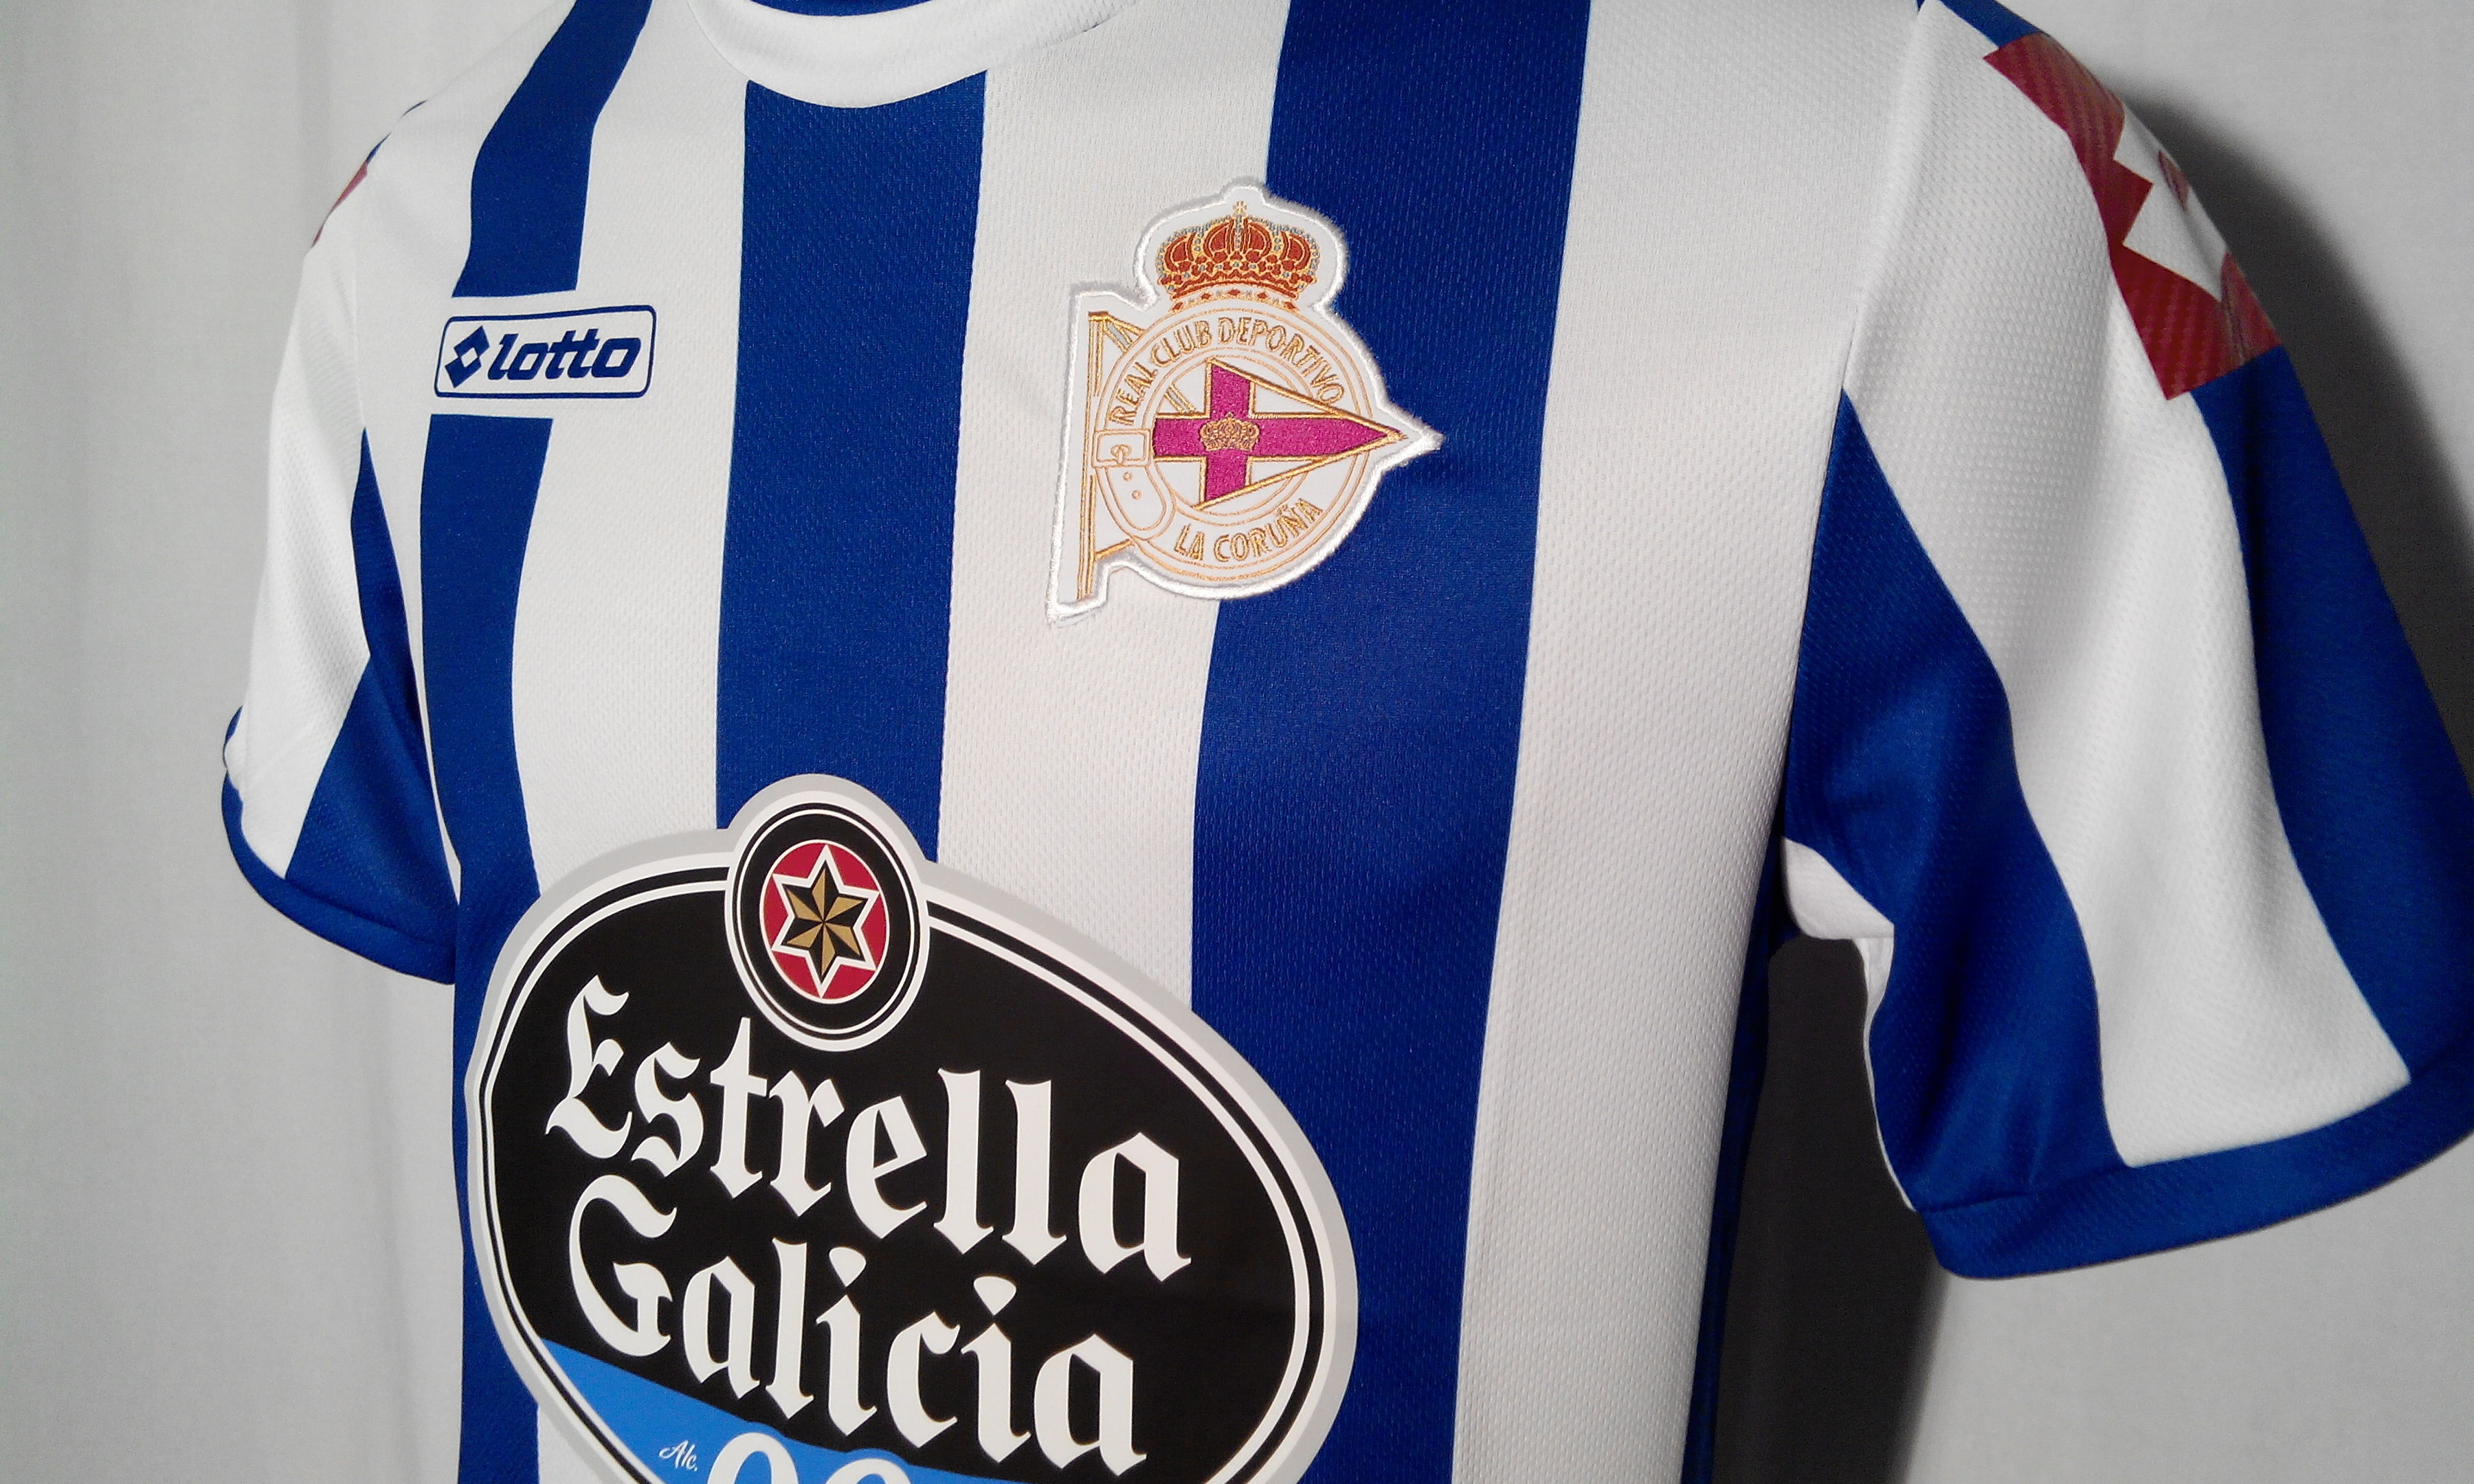 9952 - Dorsales RC Deportivo